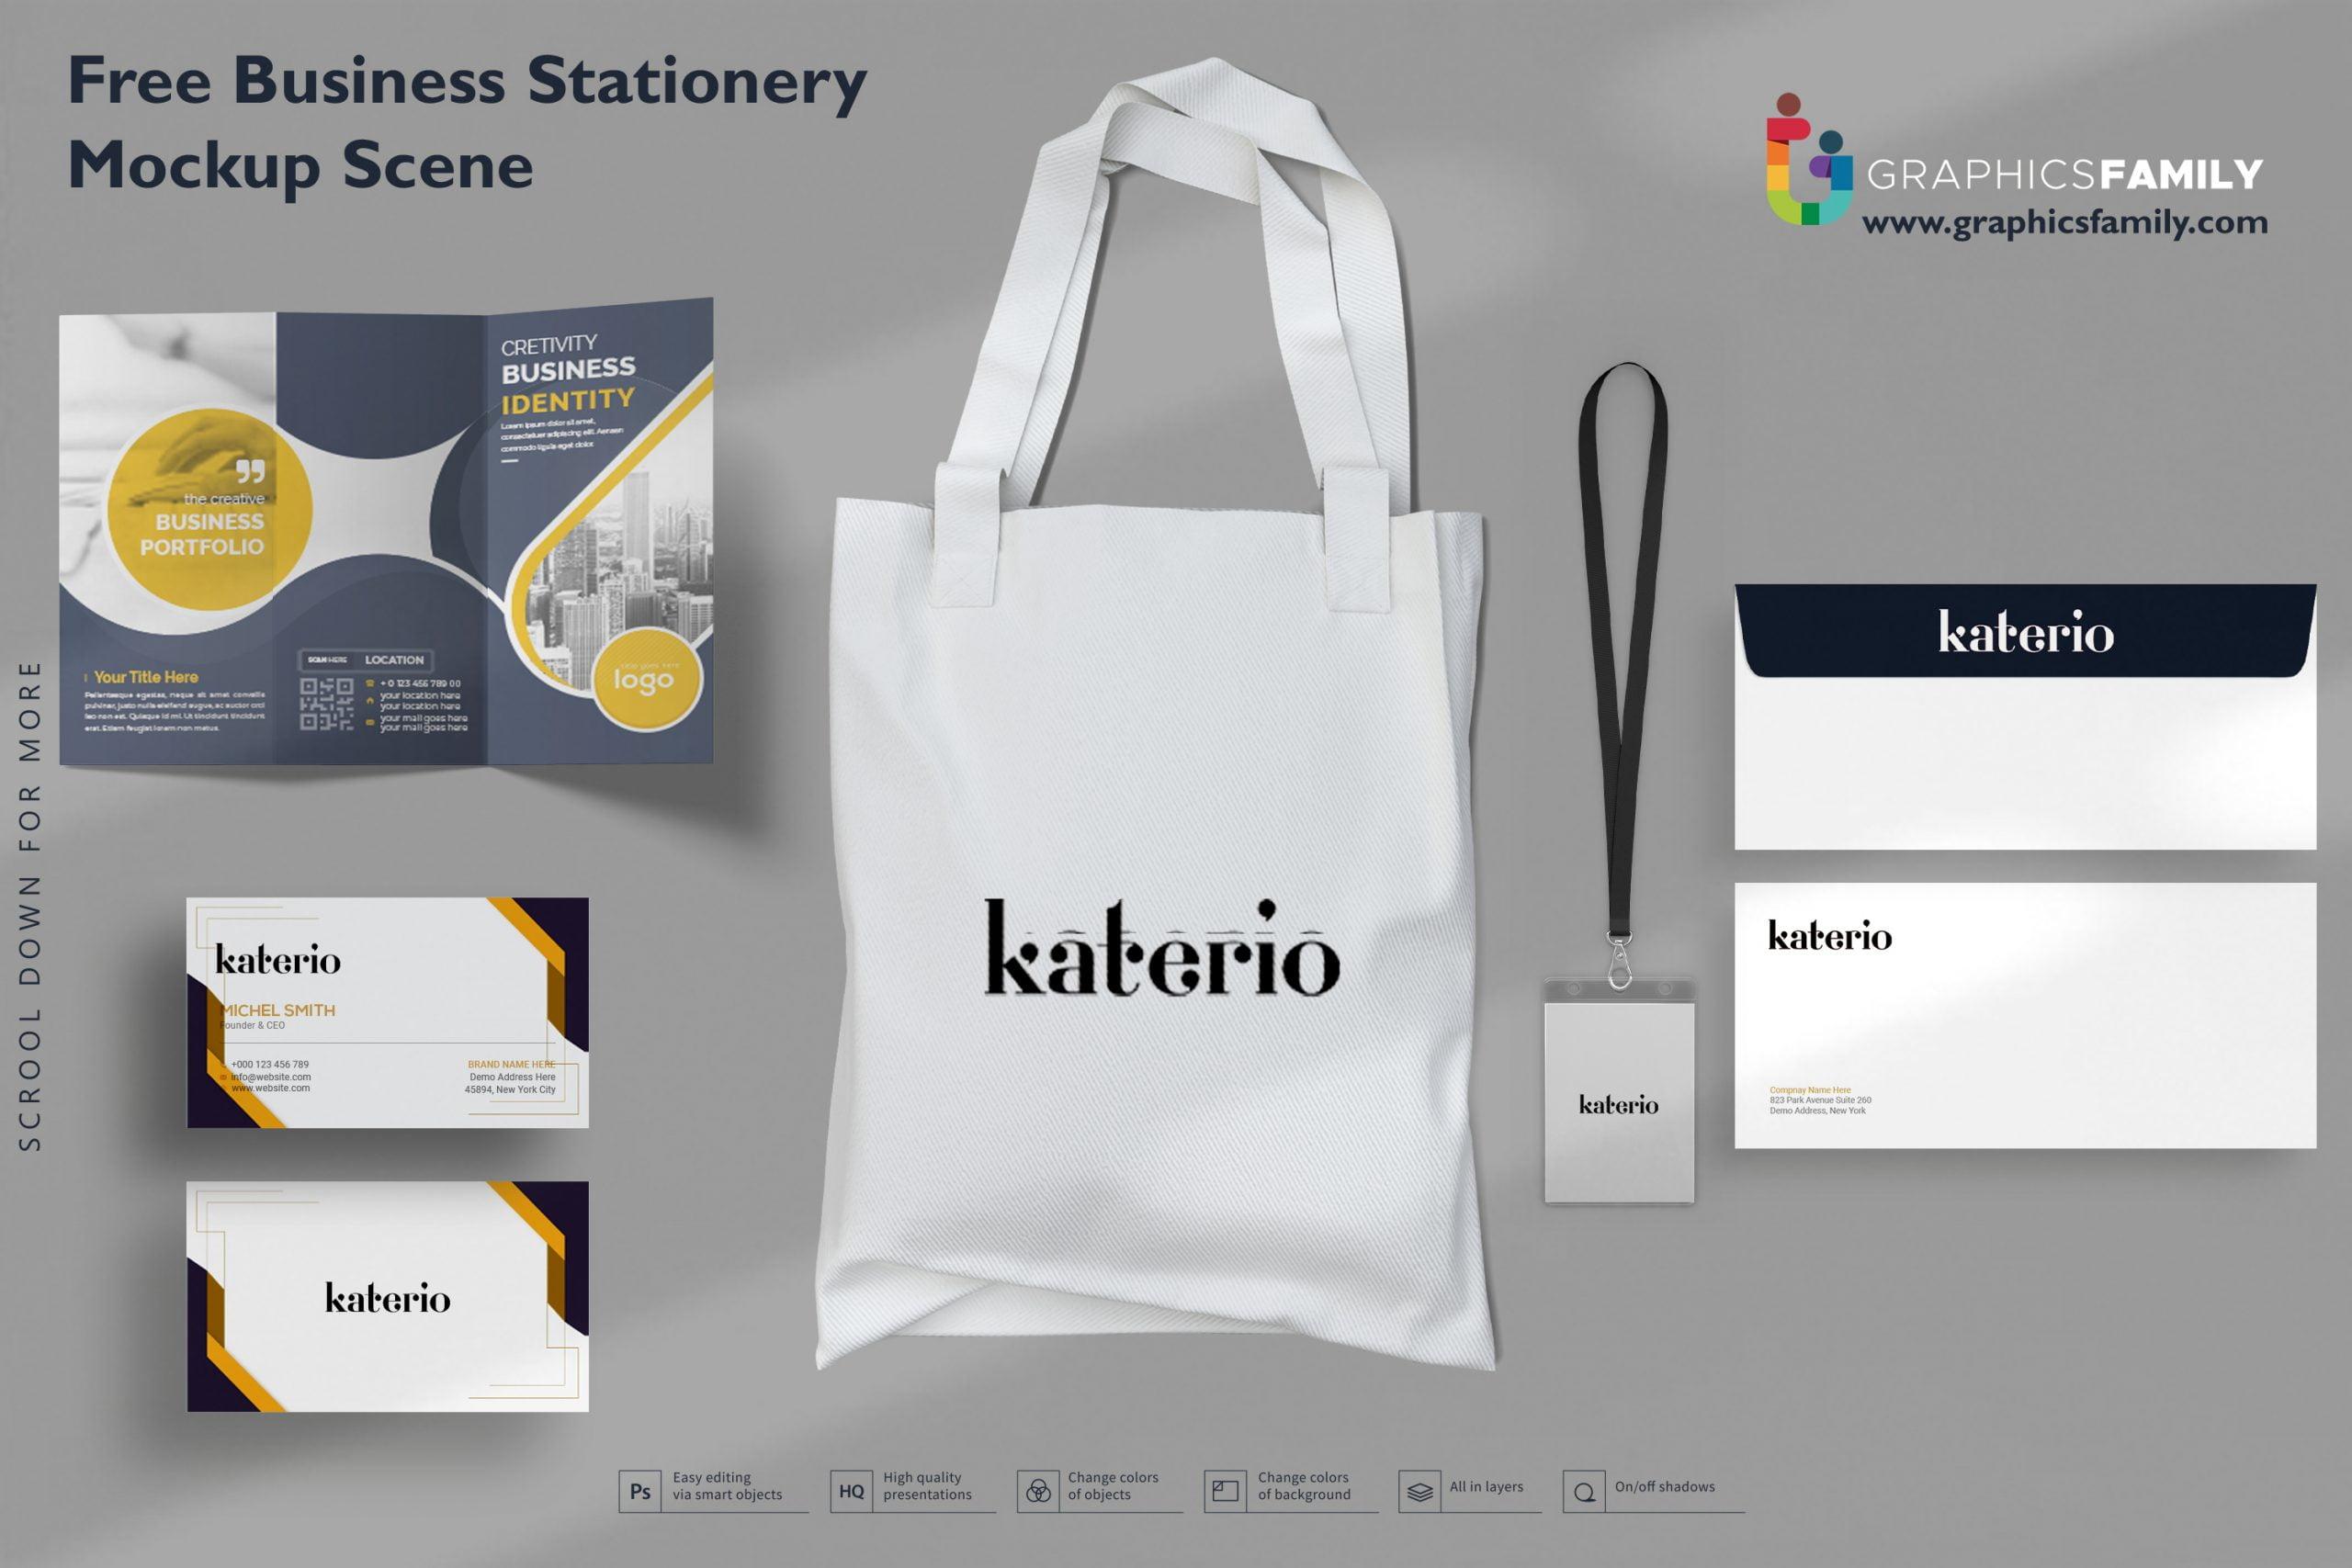 Free Business Stationery Mockup Scene